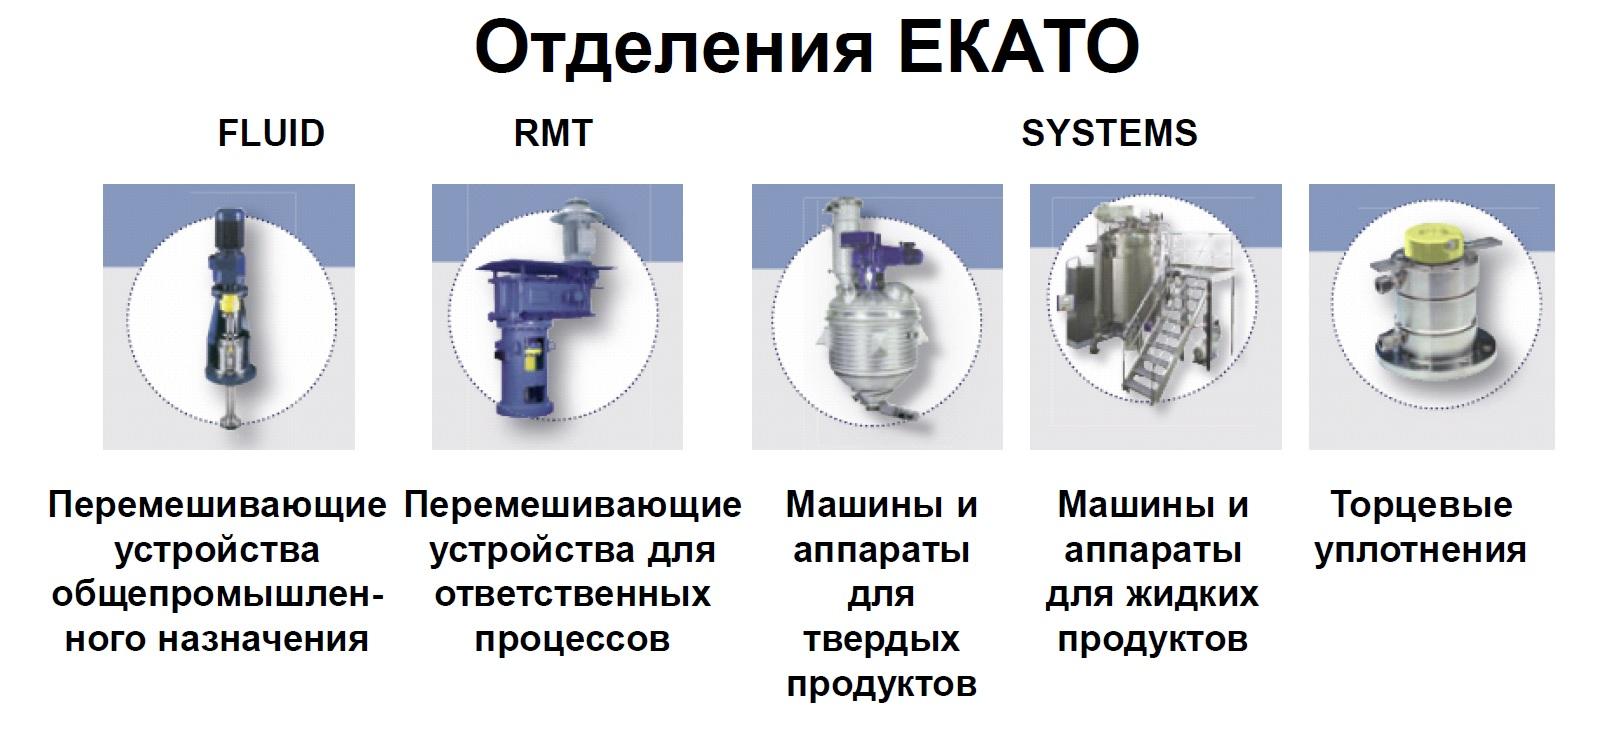 ekato industry2.jpg